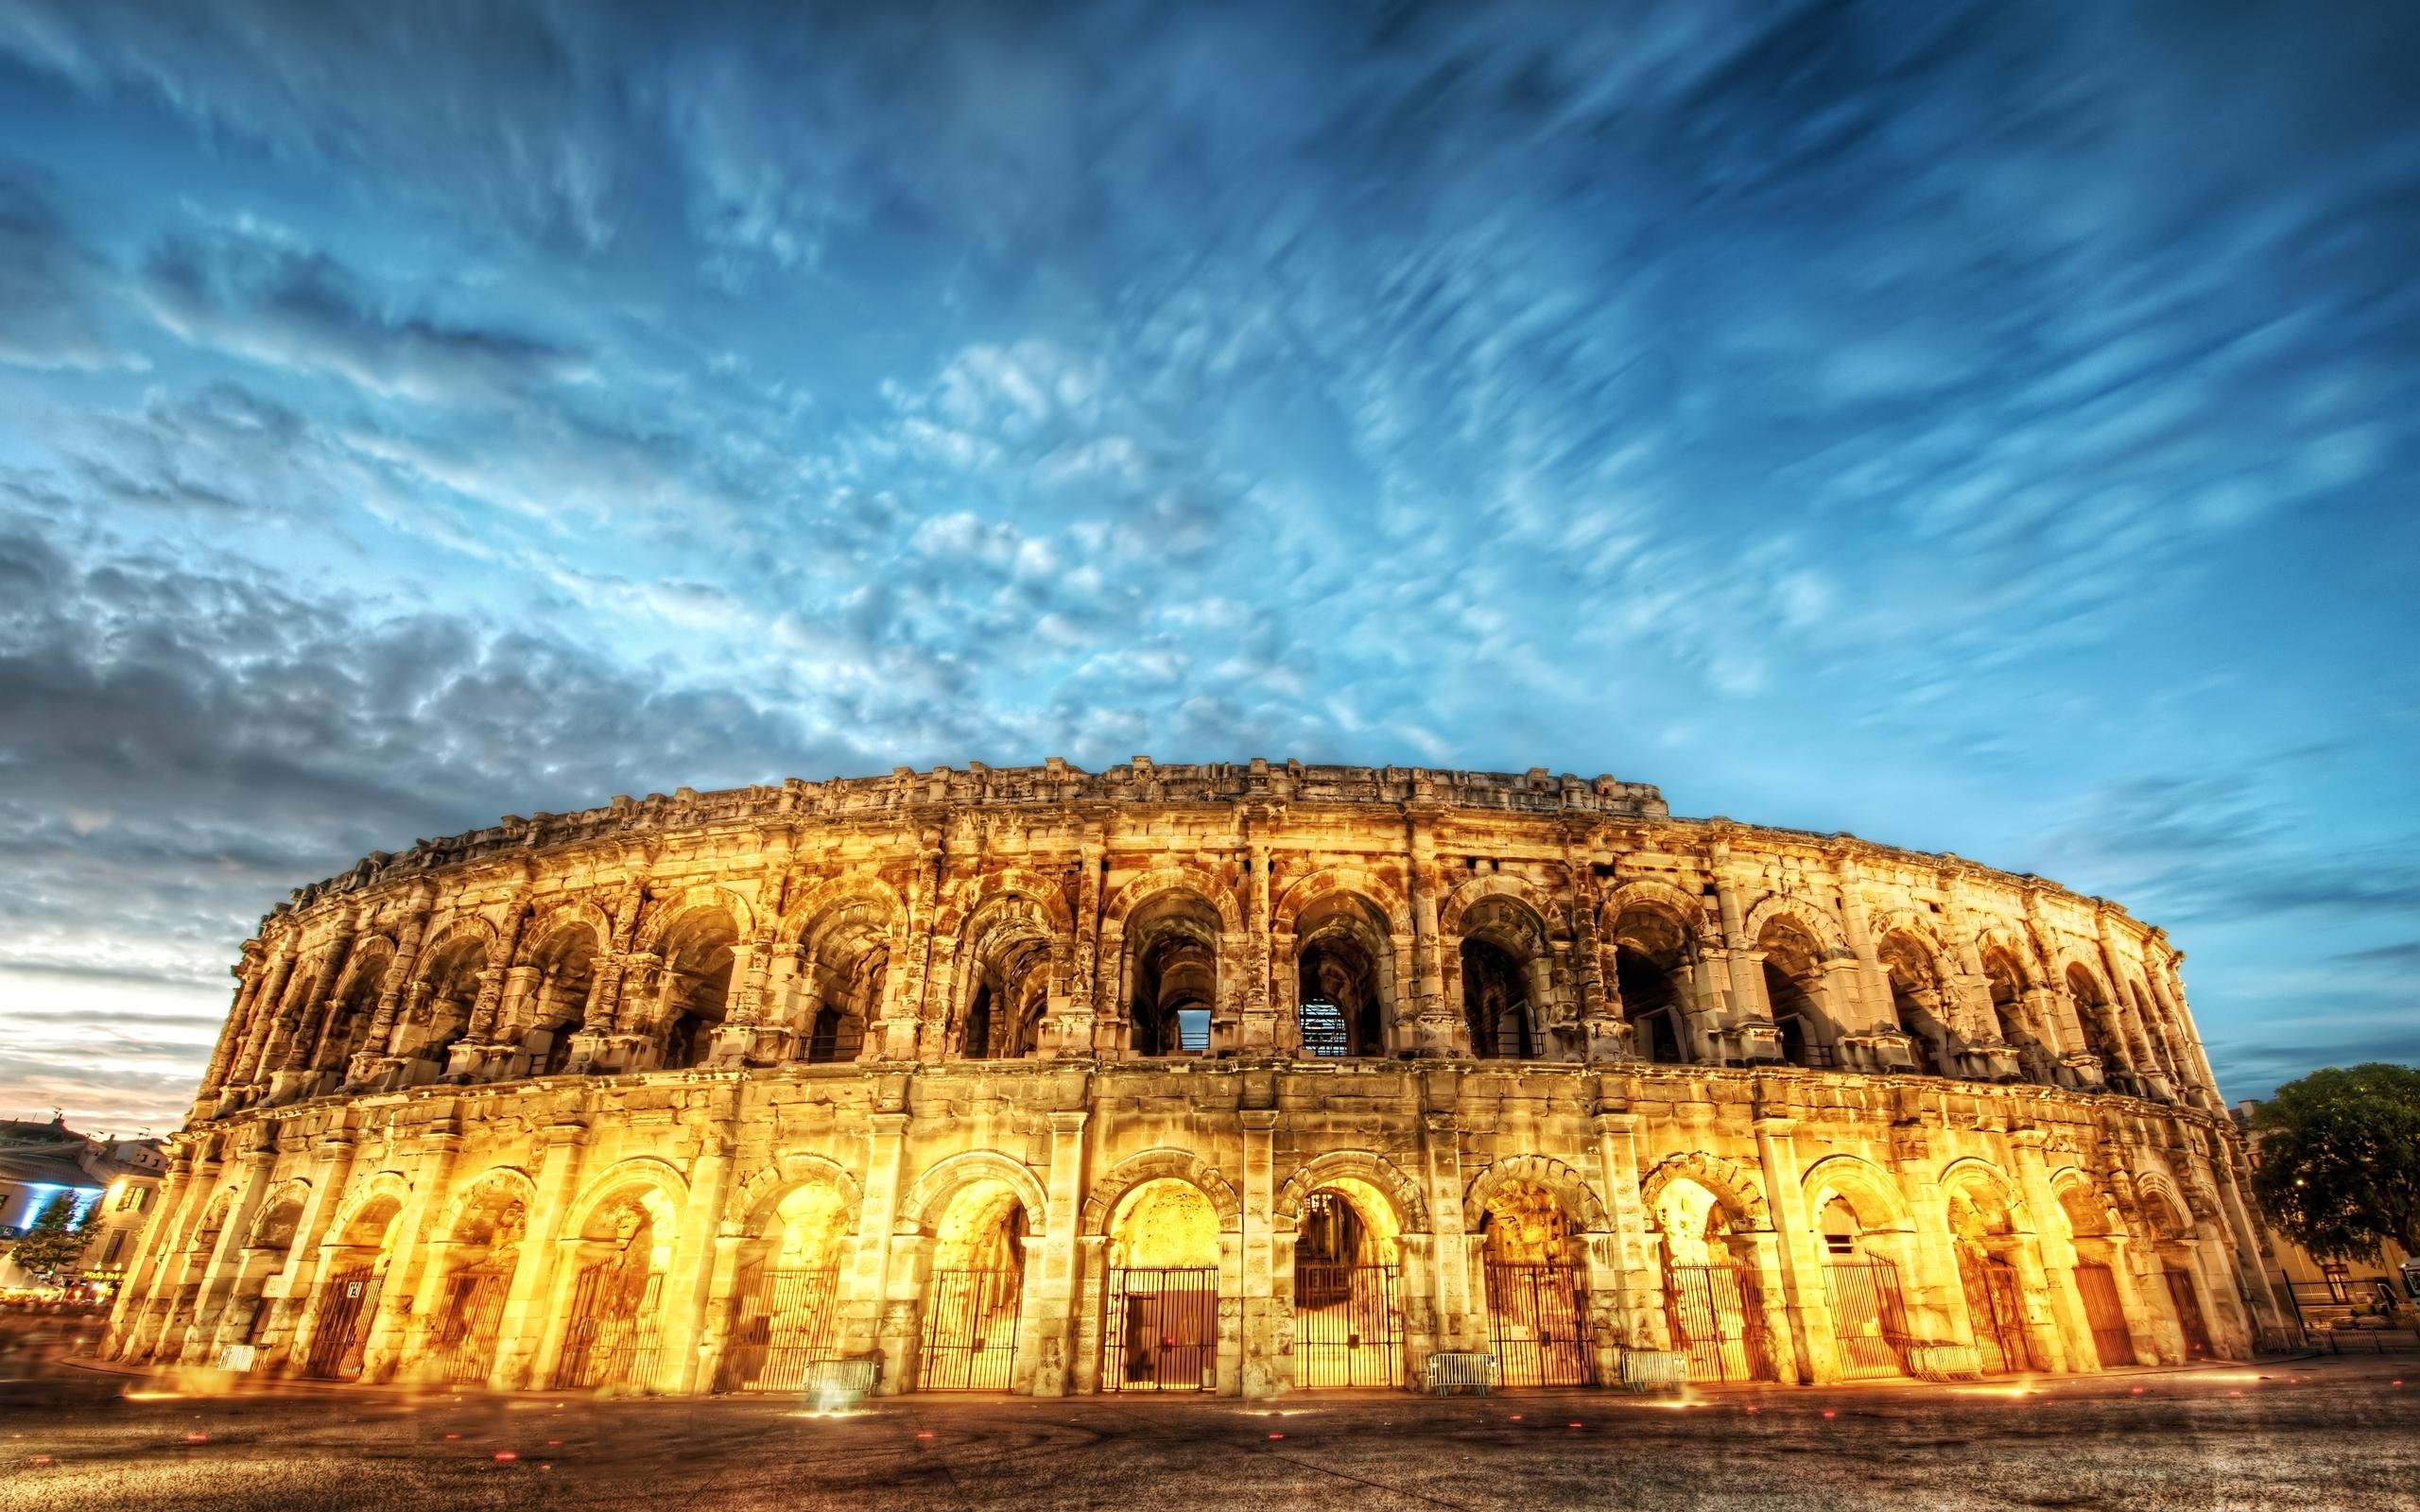 Best Wallpaper Night Colosseum - Rome-Italy-Colosseum-light-night-HDR-750808  Image.jpg